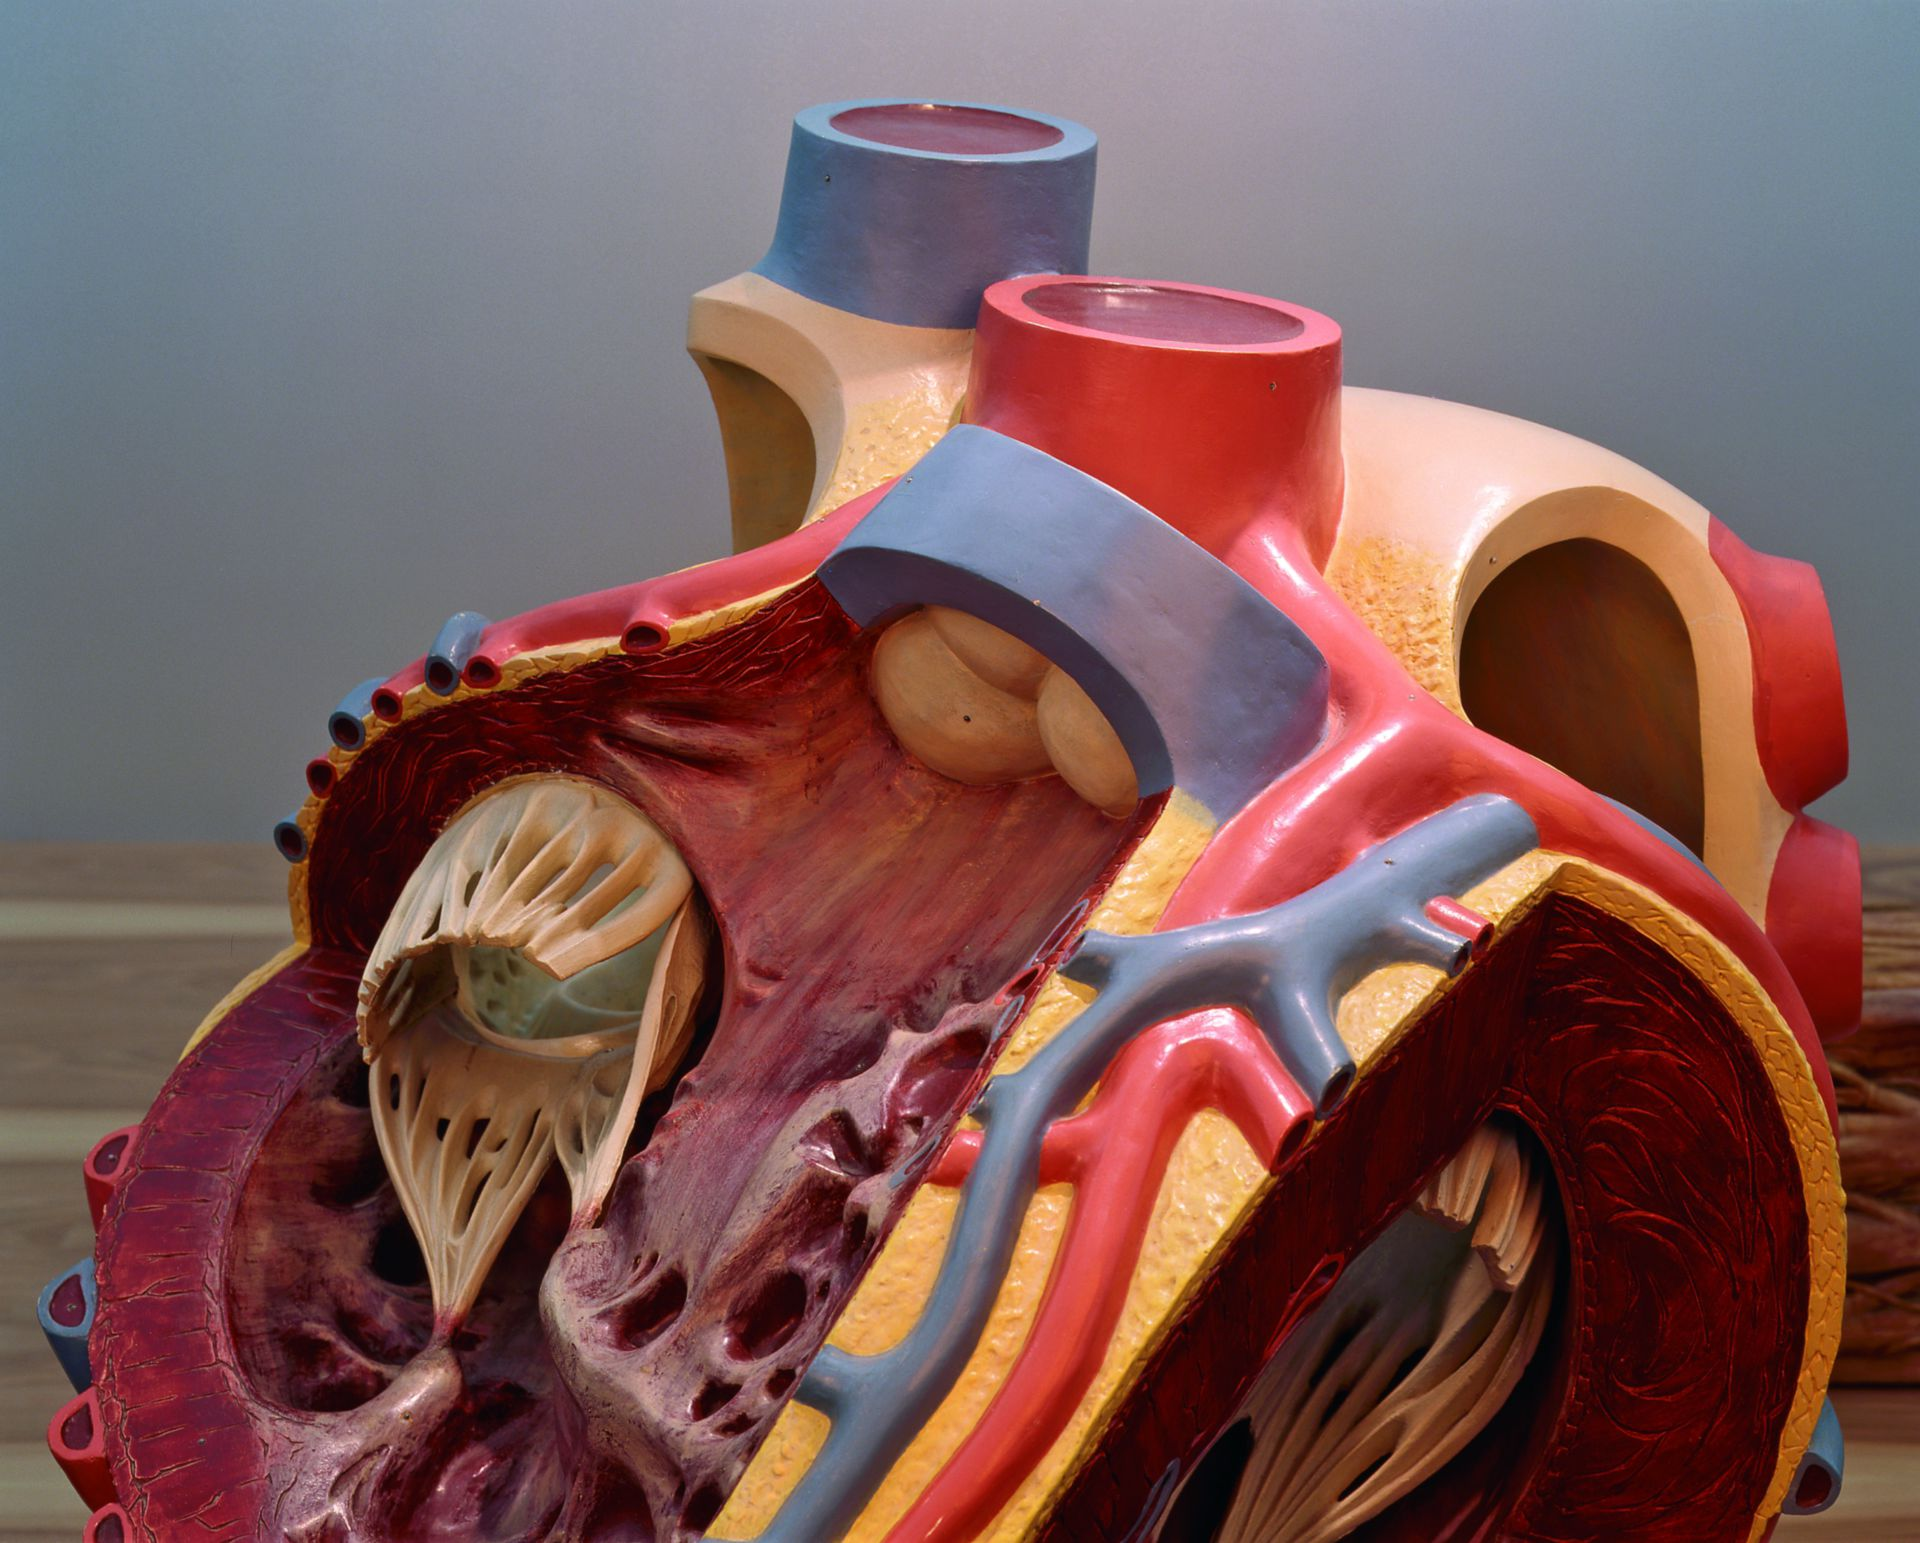 Model of a human heart